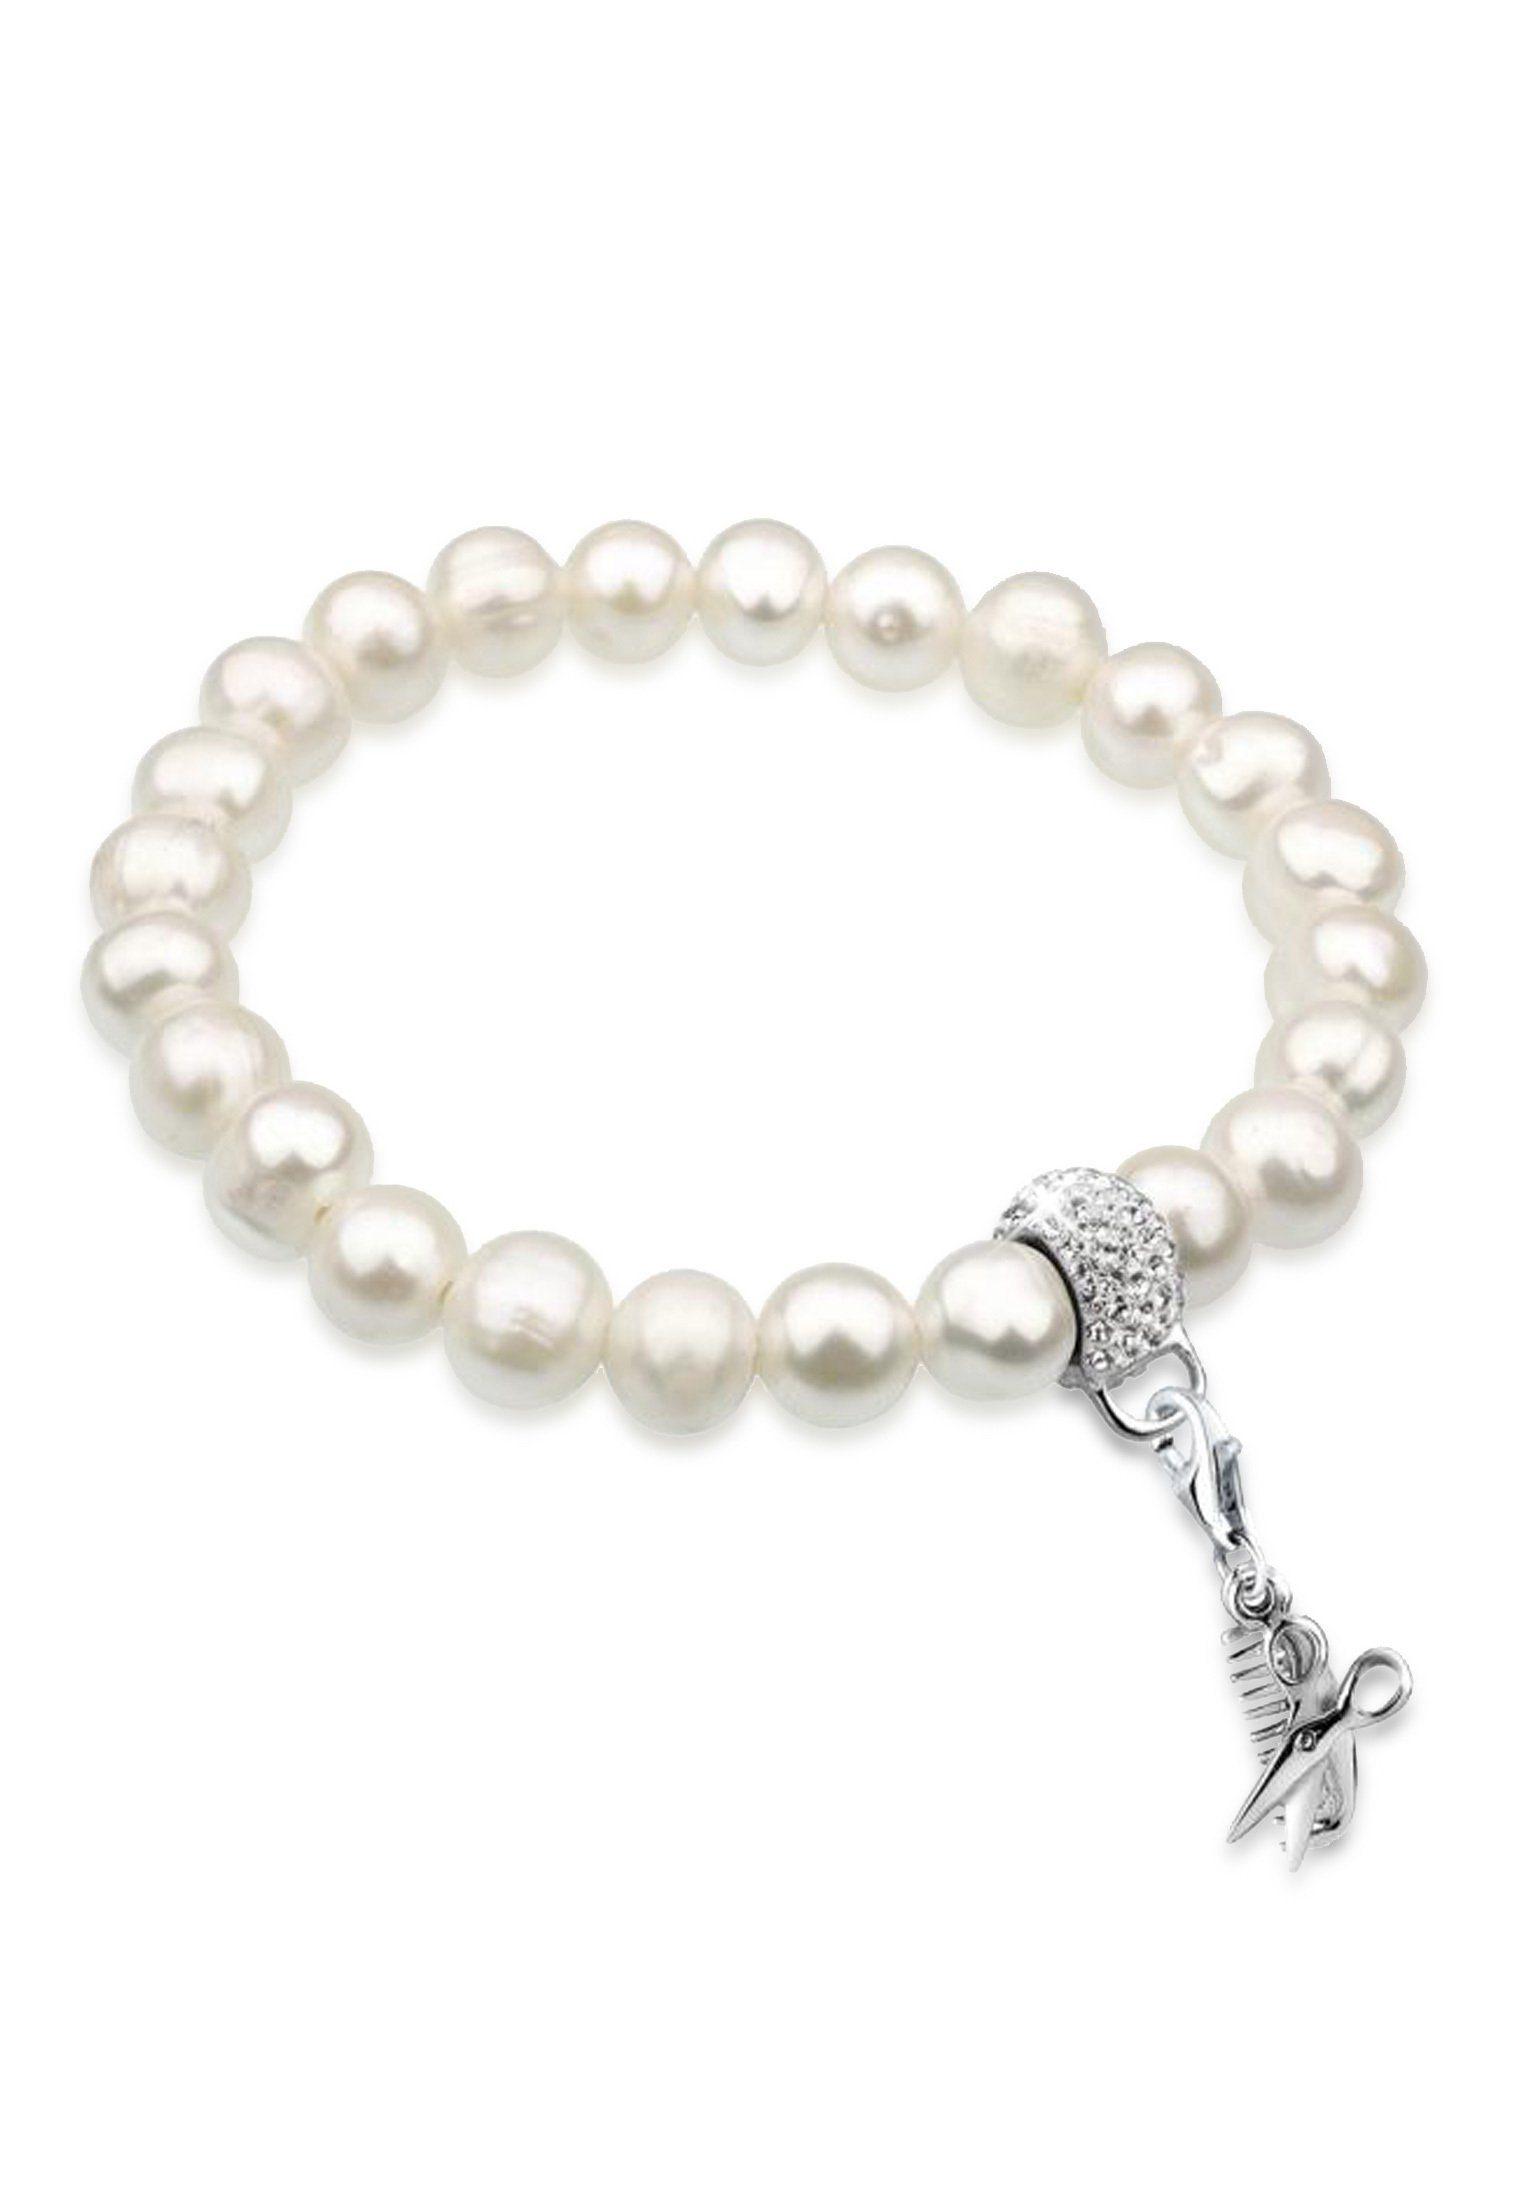 Nenalina Perlenarmband »Schere Kamm Perlen Swarovski® Kristalle 925 Silber«